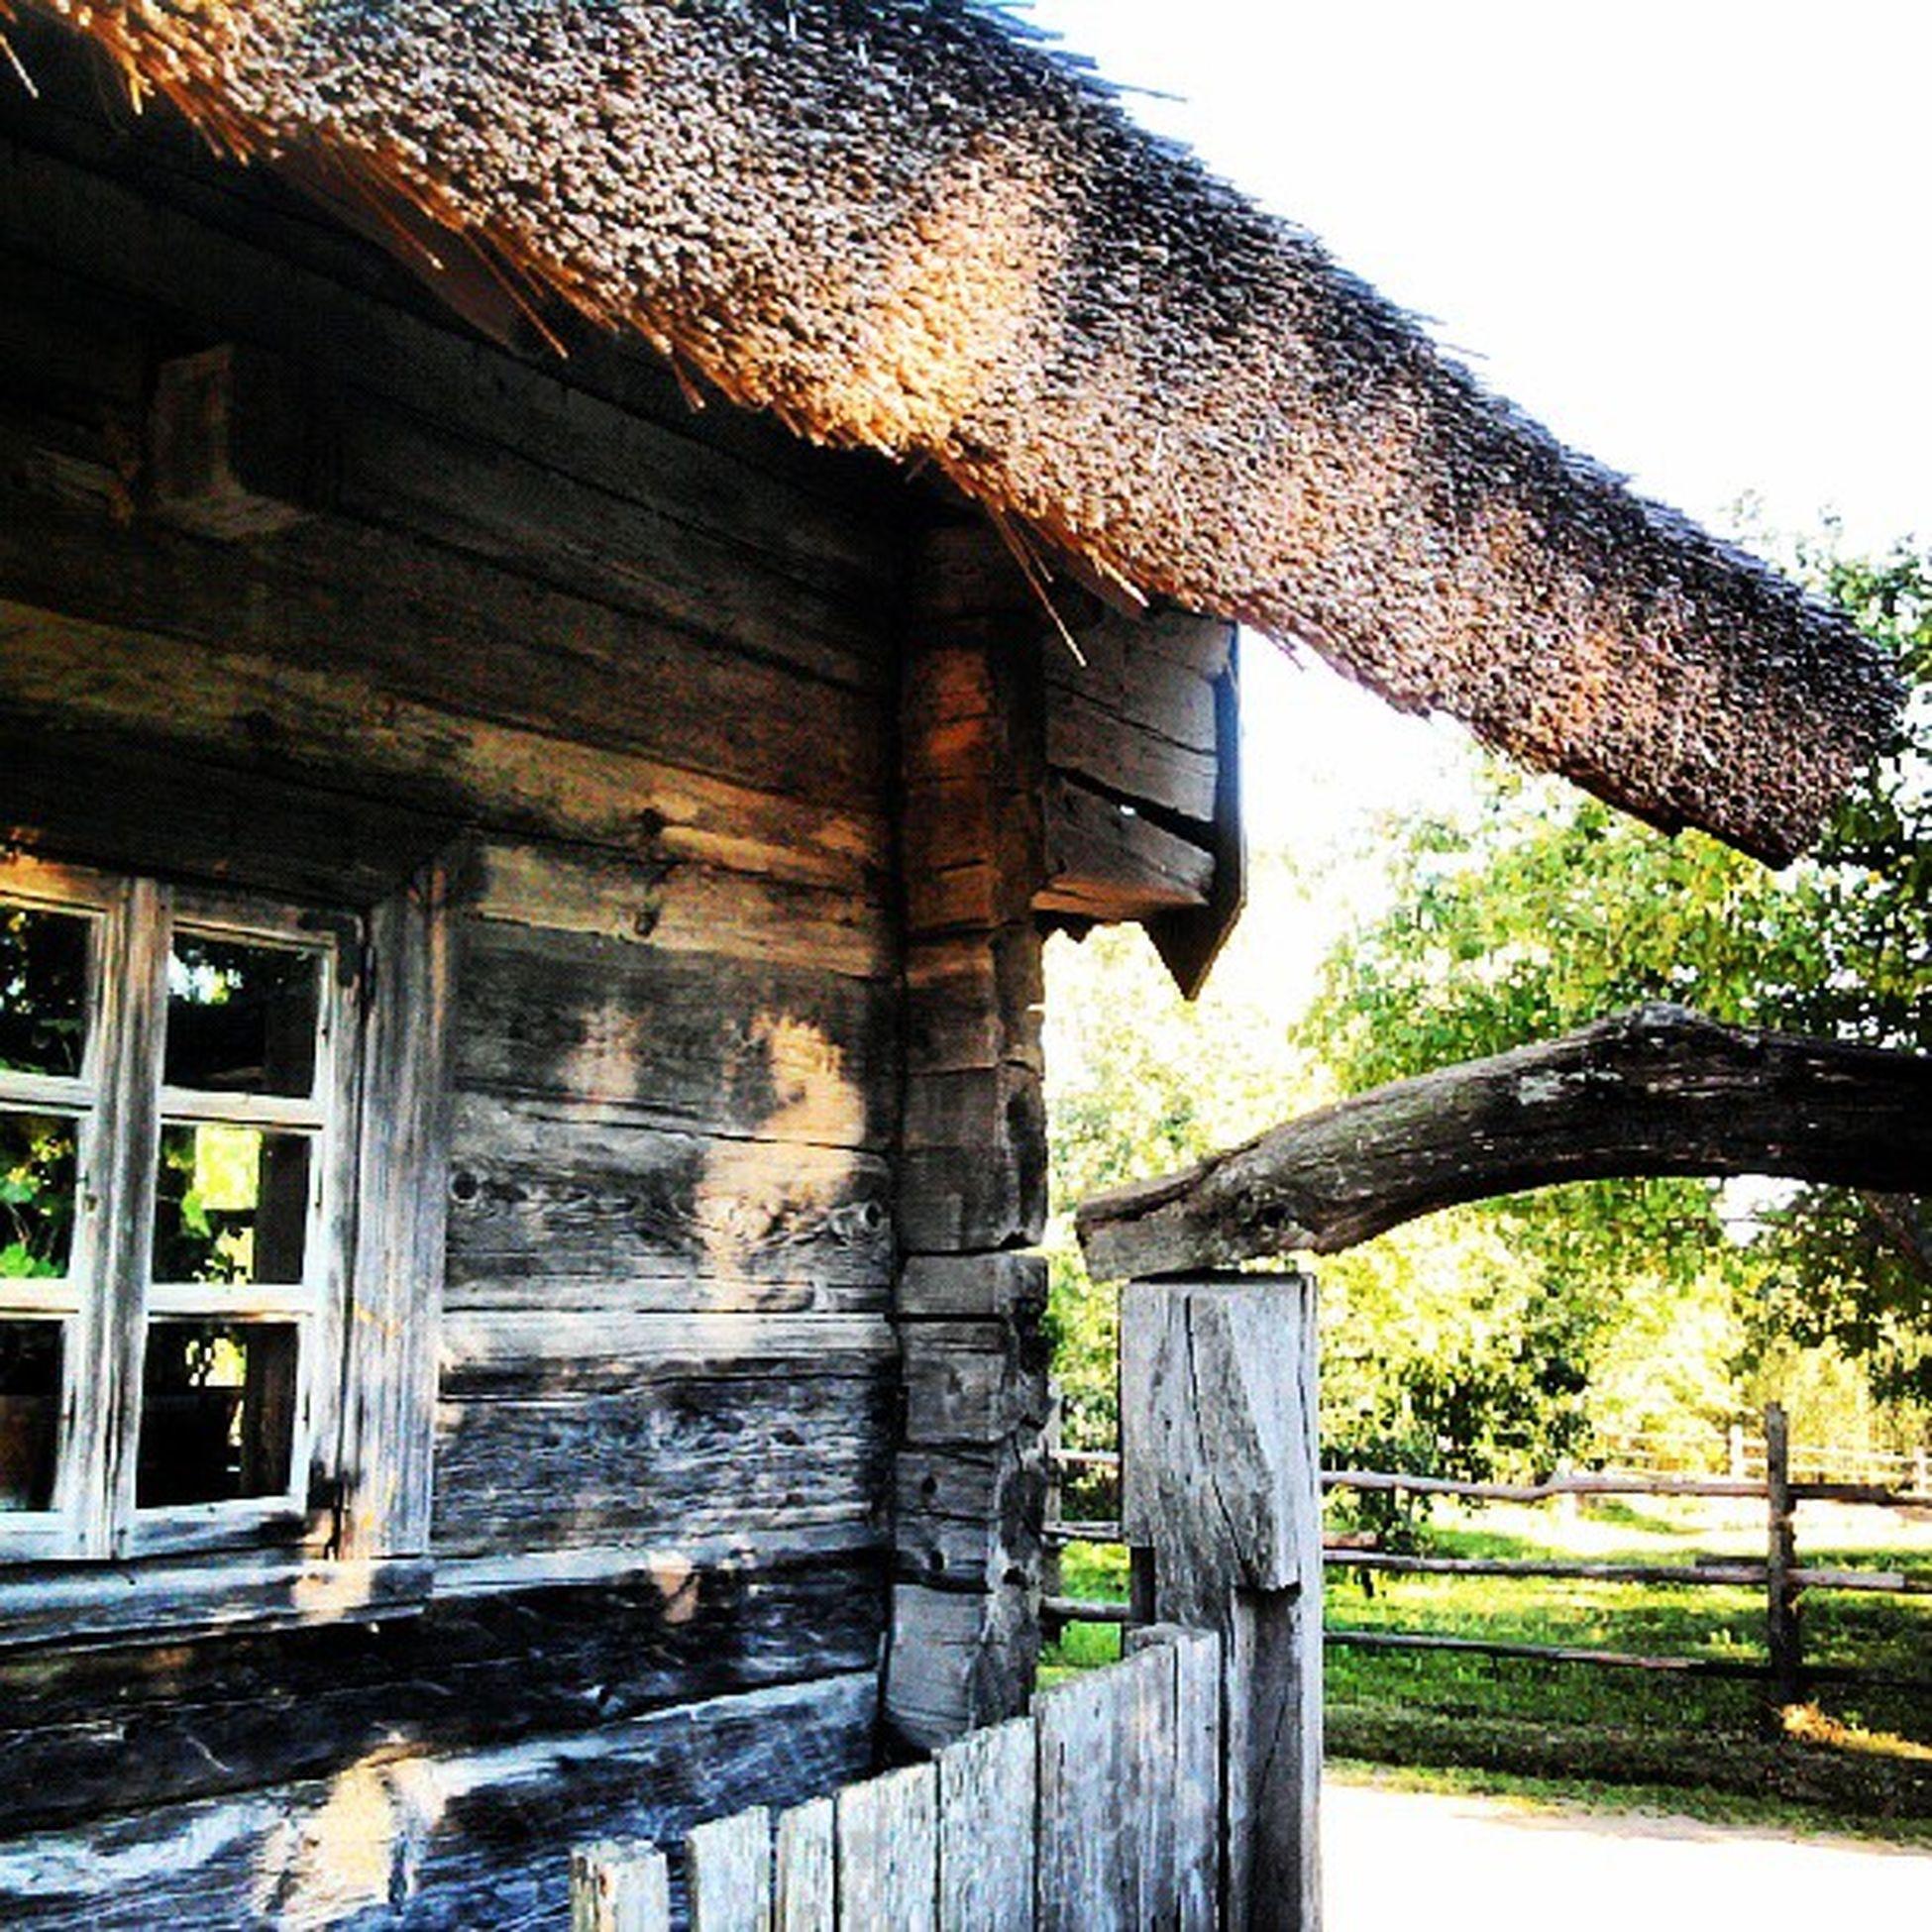 Belarus Instabelarus Architecture Kam2013 kff2013